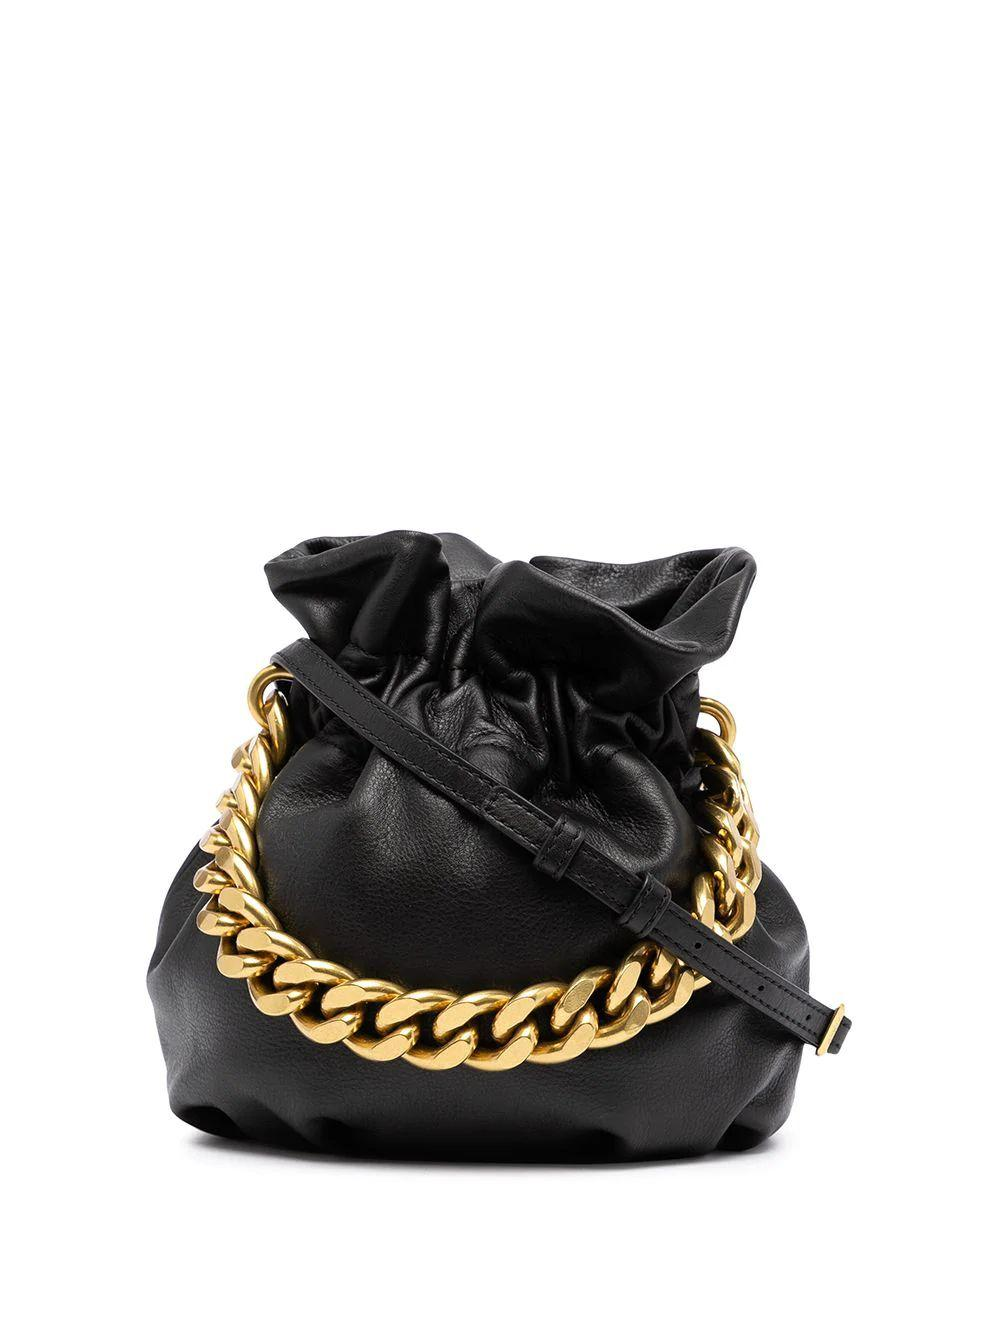 Grace Chain Bag